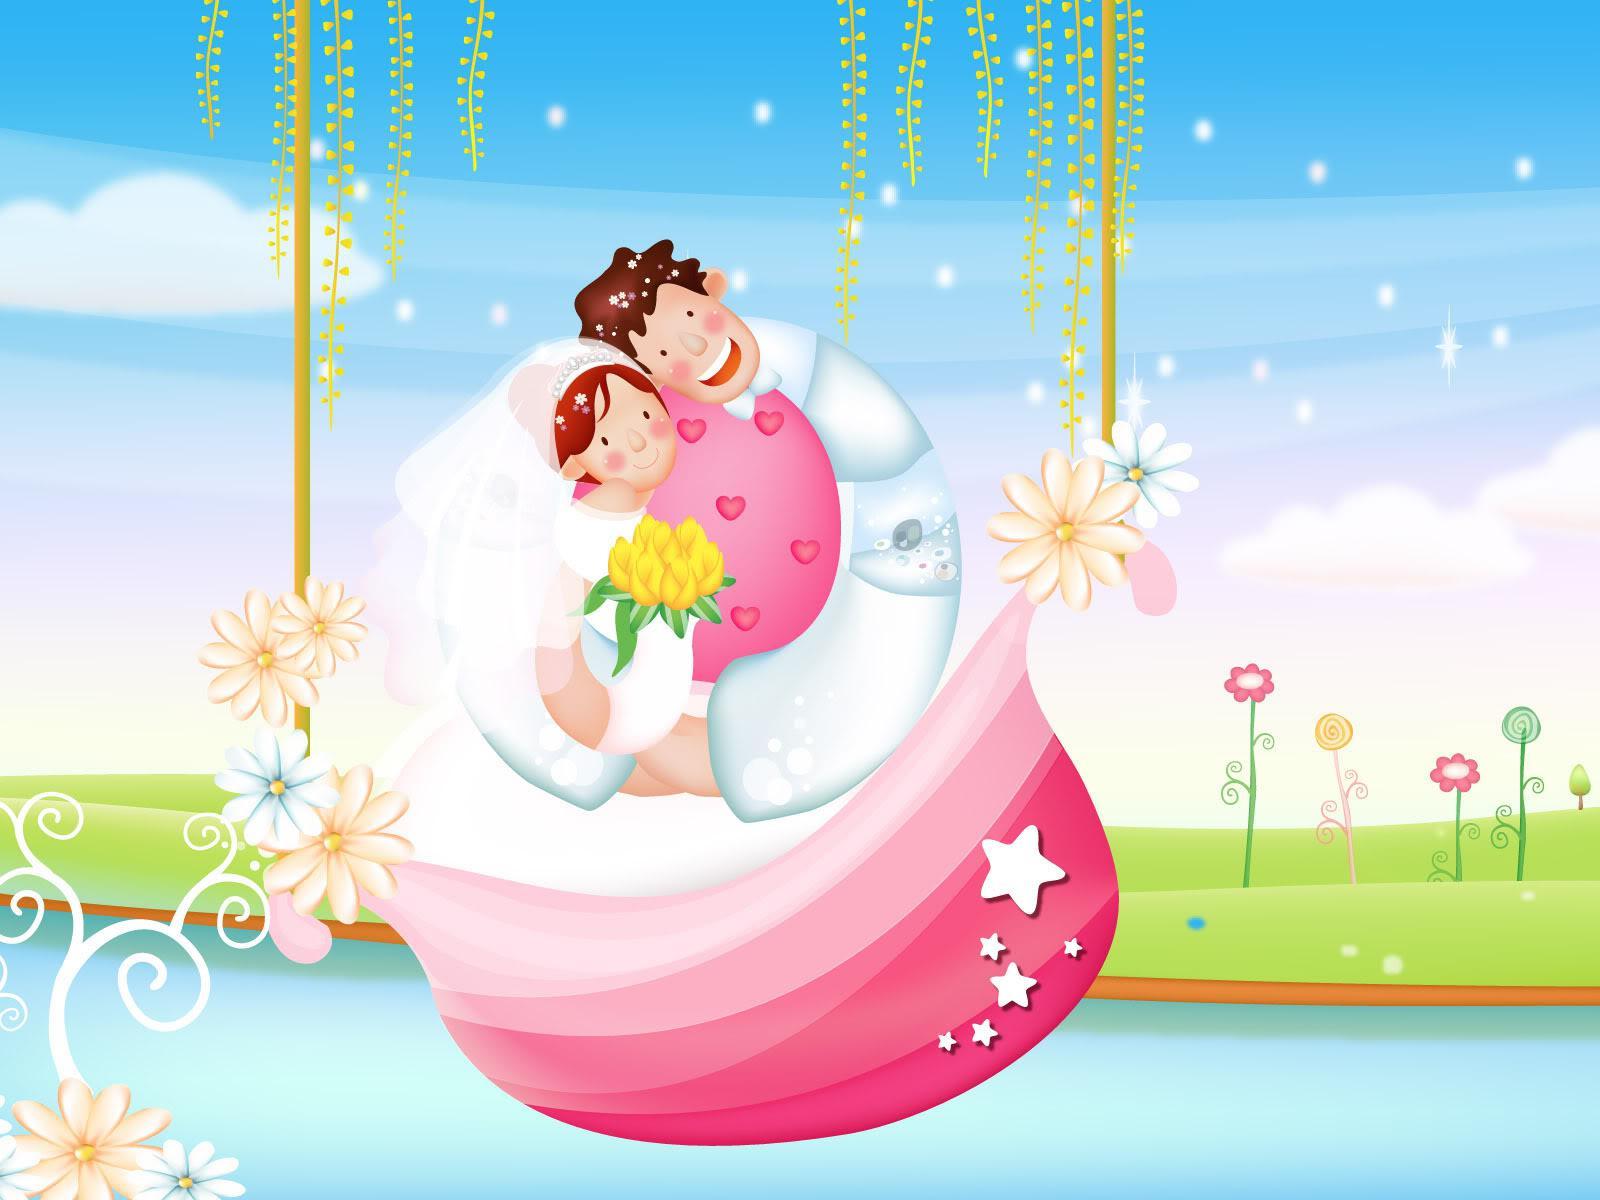 http://4.bp.blogspot.com/-zYhjXcihjP4/UY8Bnb27PbI/AAAAAAAAxNs/r83bdg2DEac/s1600/Love+Couple+Wallpapers+(17).jpg